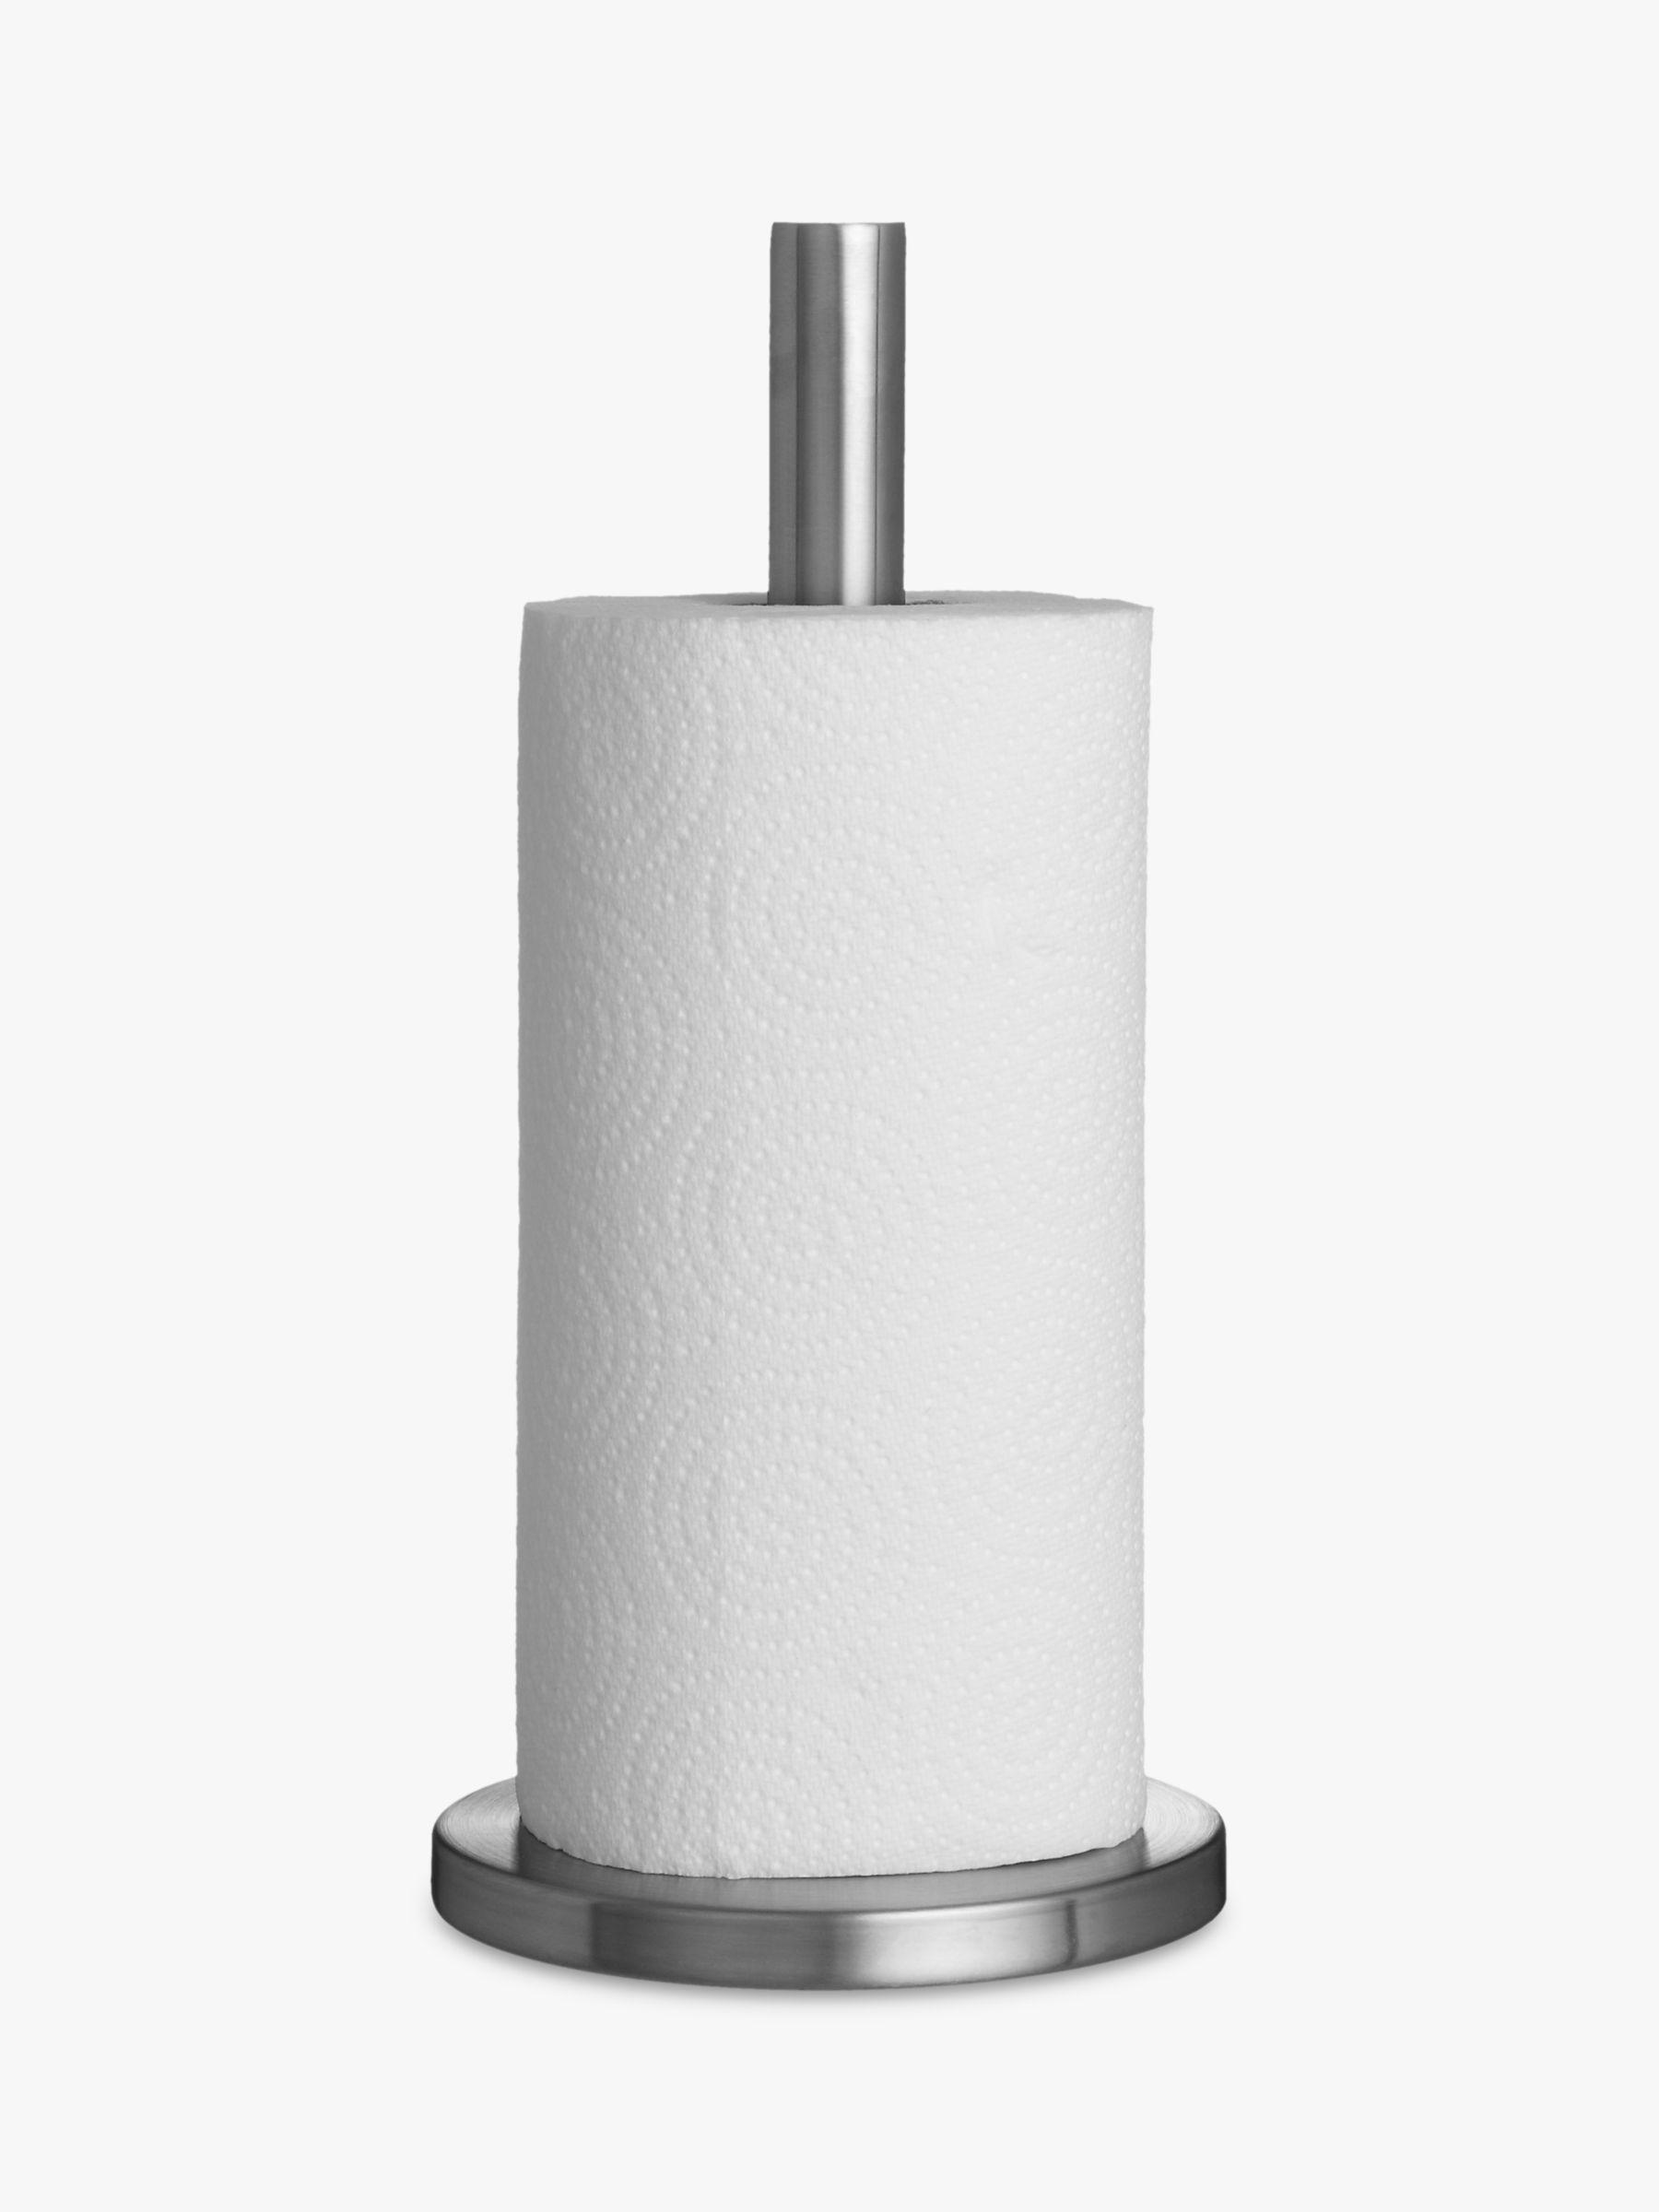 kitchen paper towel holder design rochester ny john lewis partners roll stainless steel at buyjohn online johnlewis com